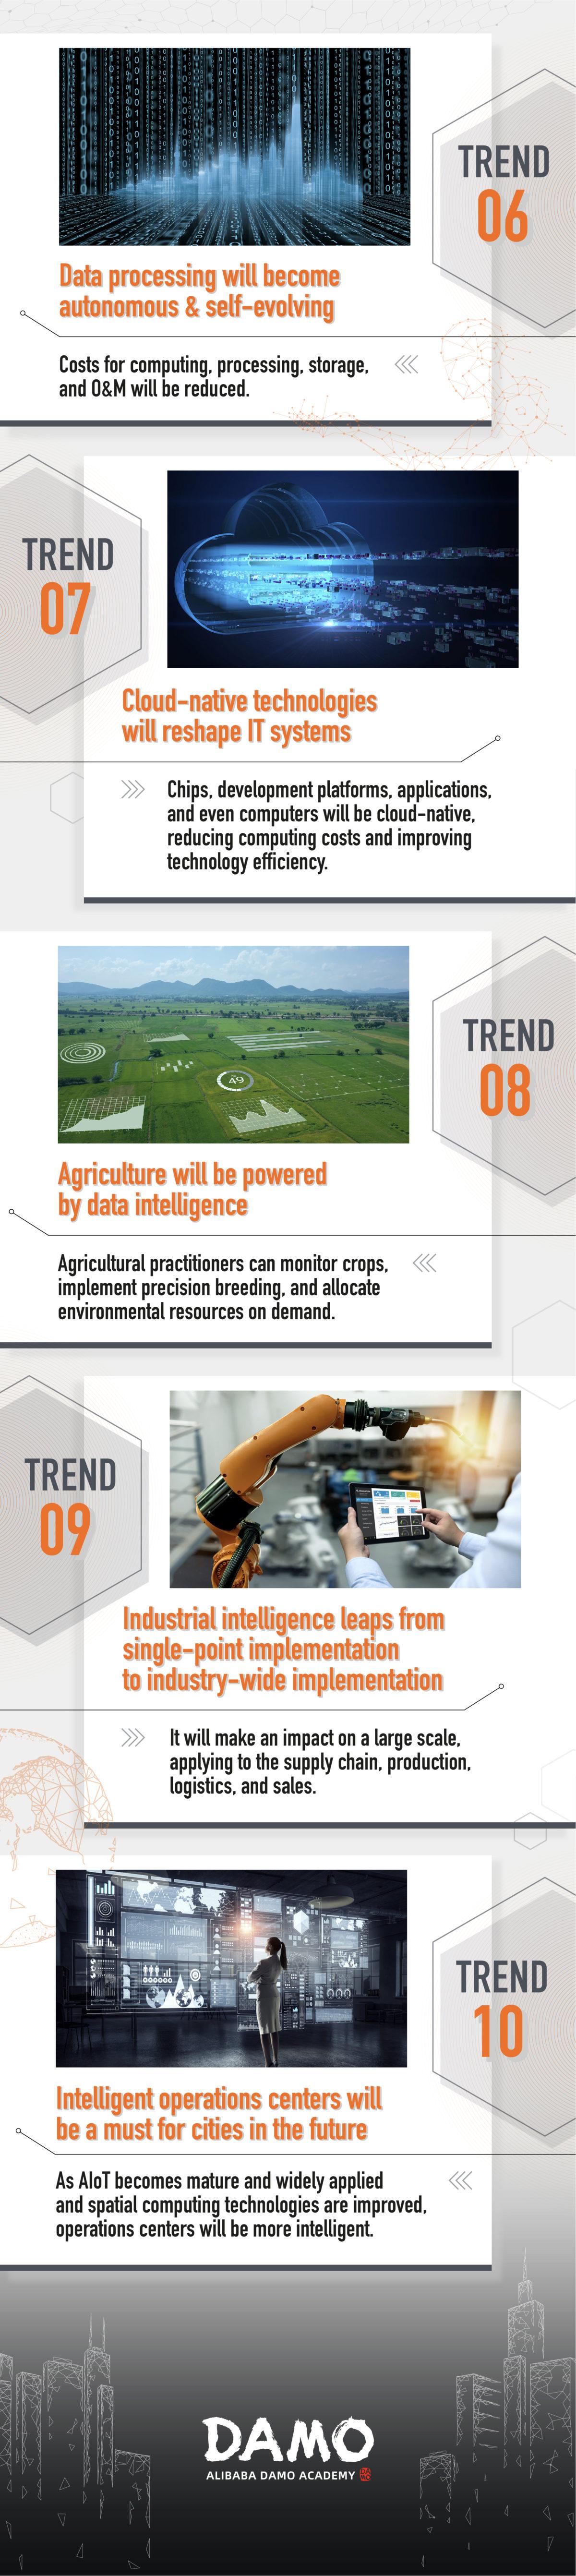 Alibaba_Damo Academy 2021 Tech Trend_Infographic (ENG) 02